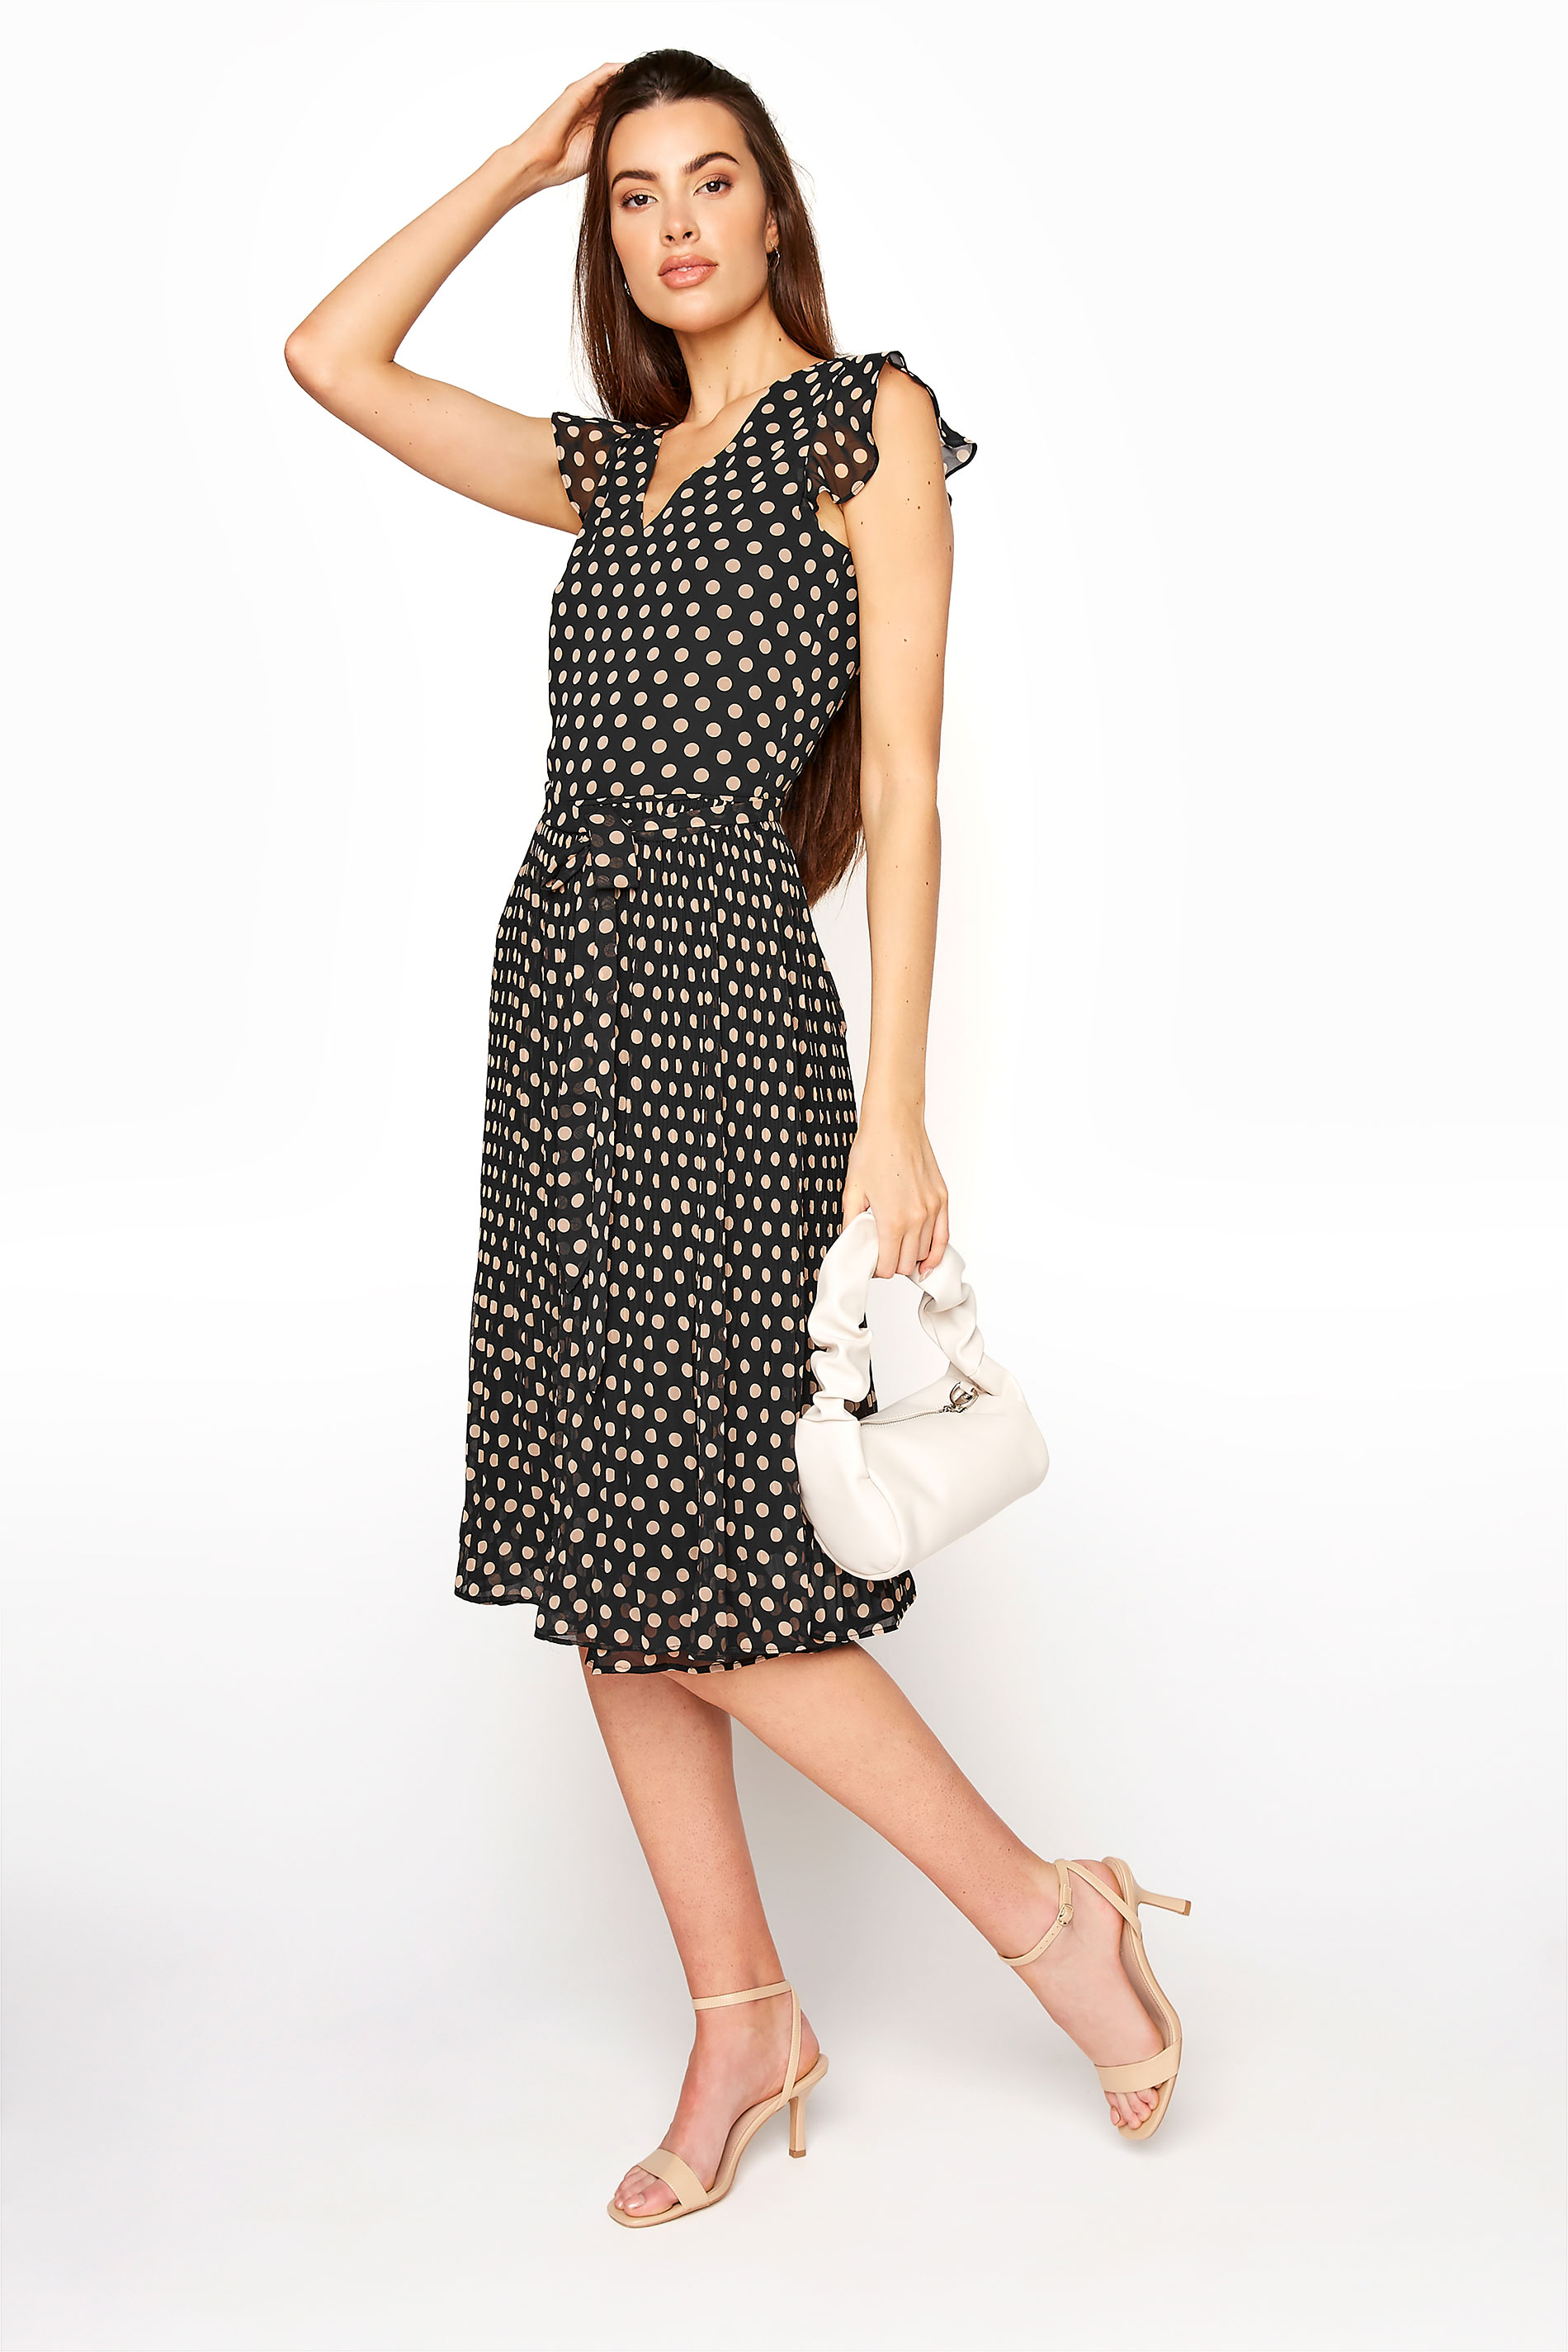 LTS Black Polka Dot Chiffon Dress